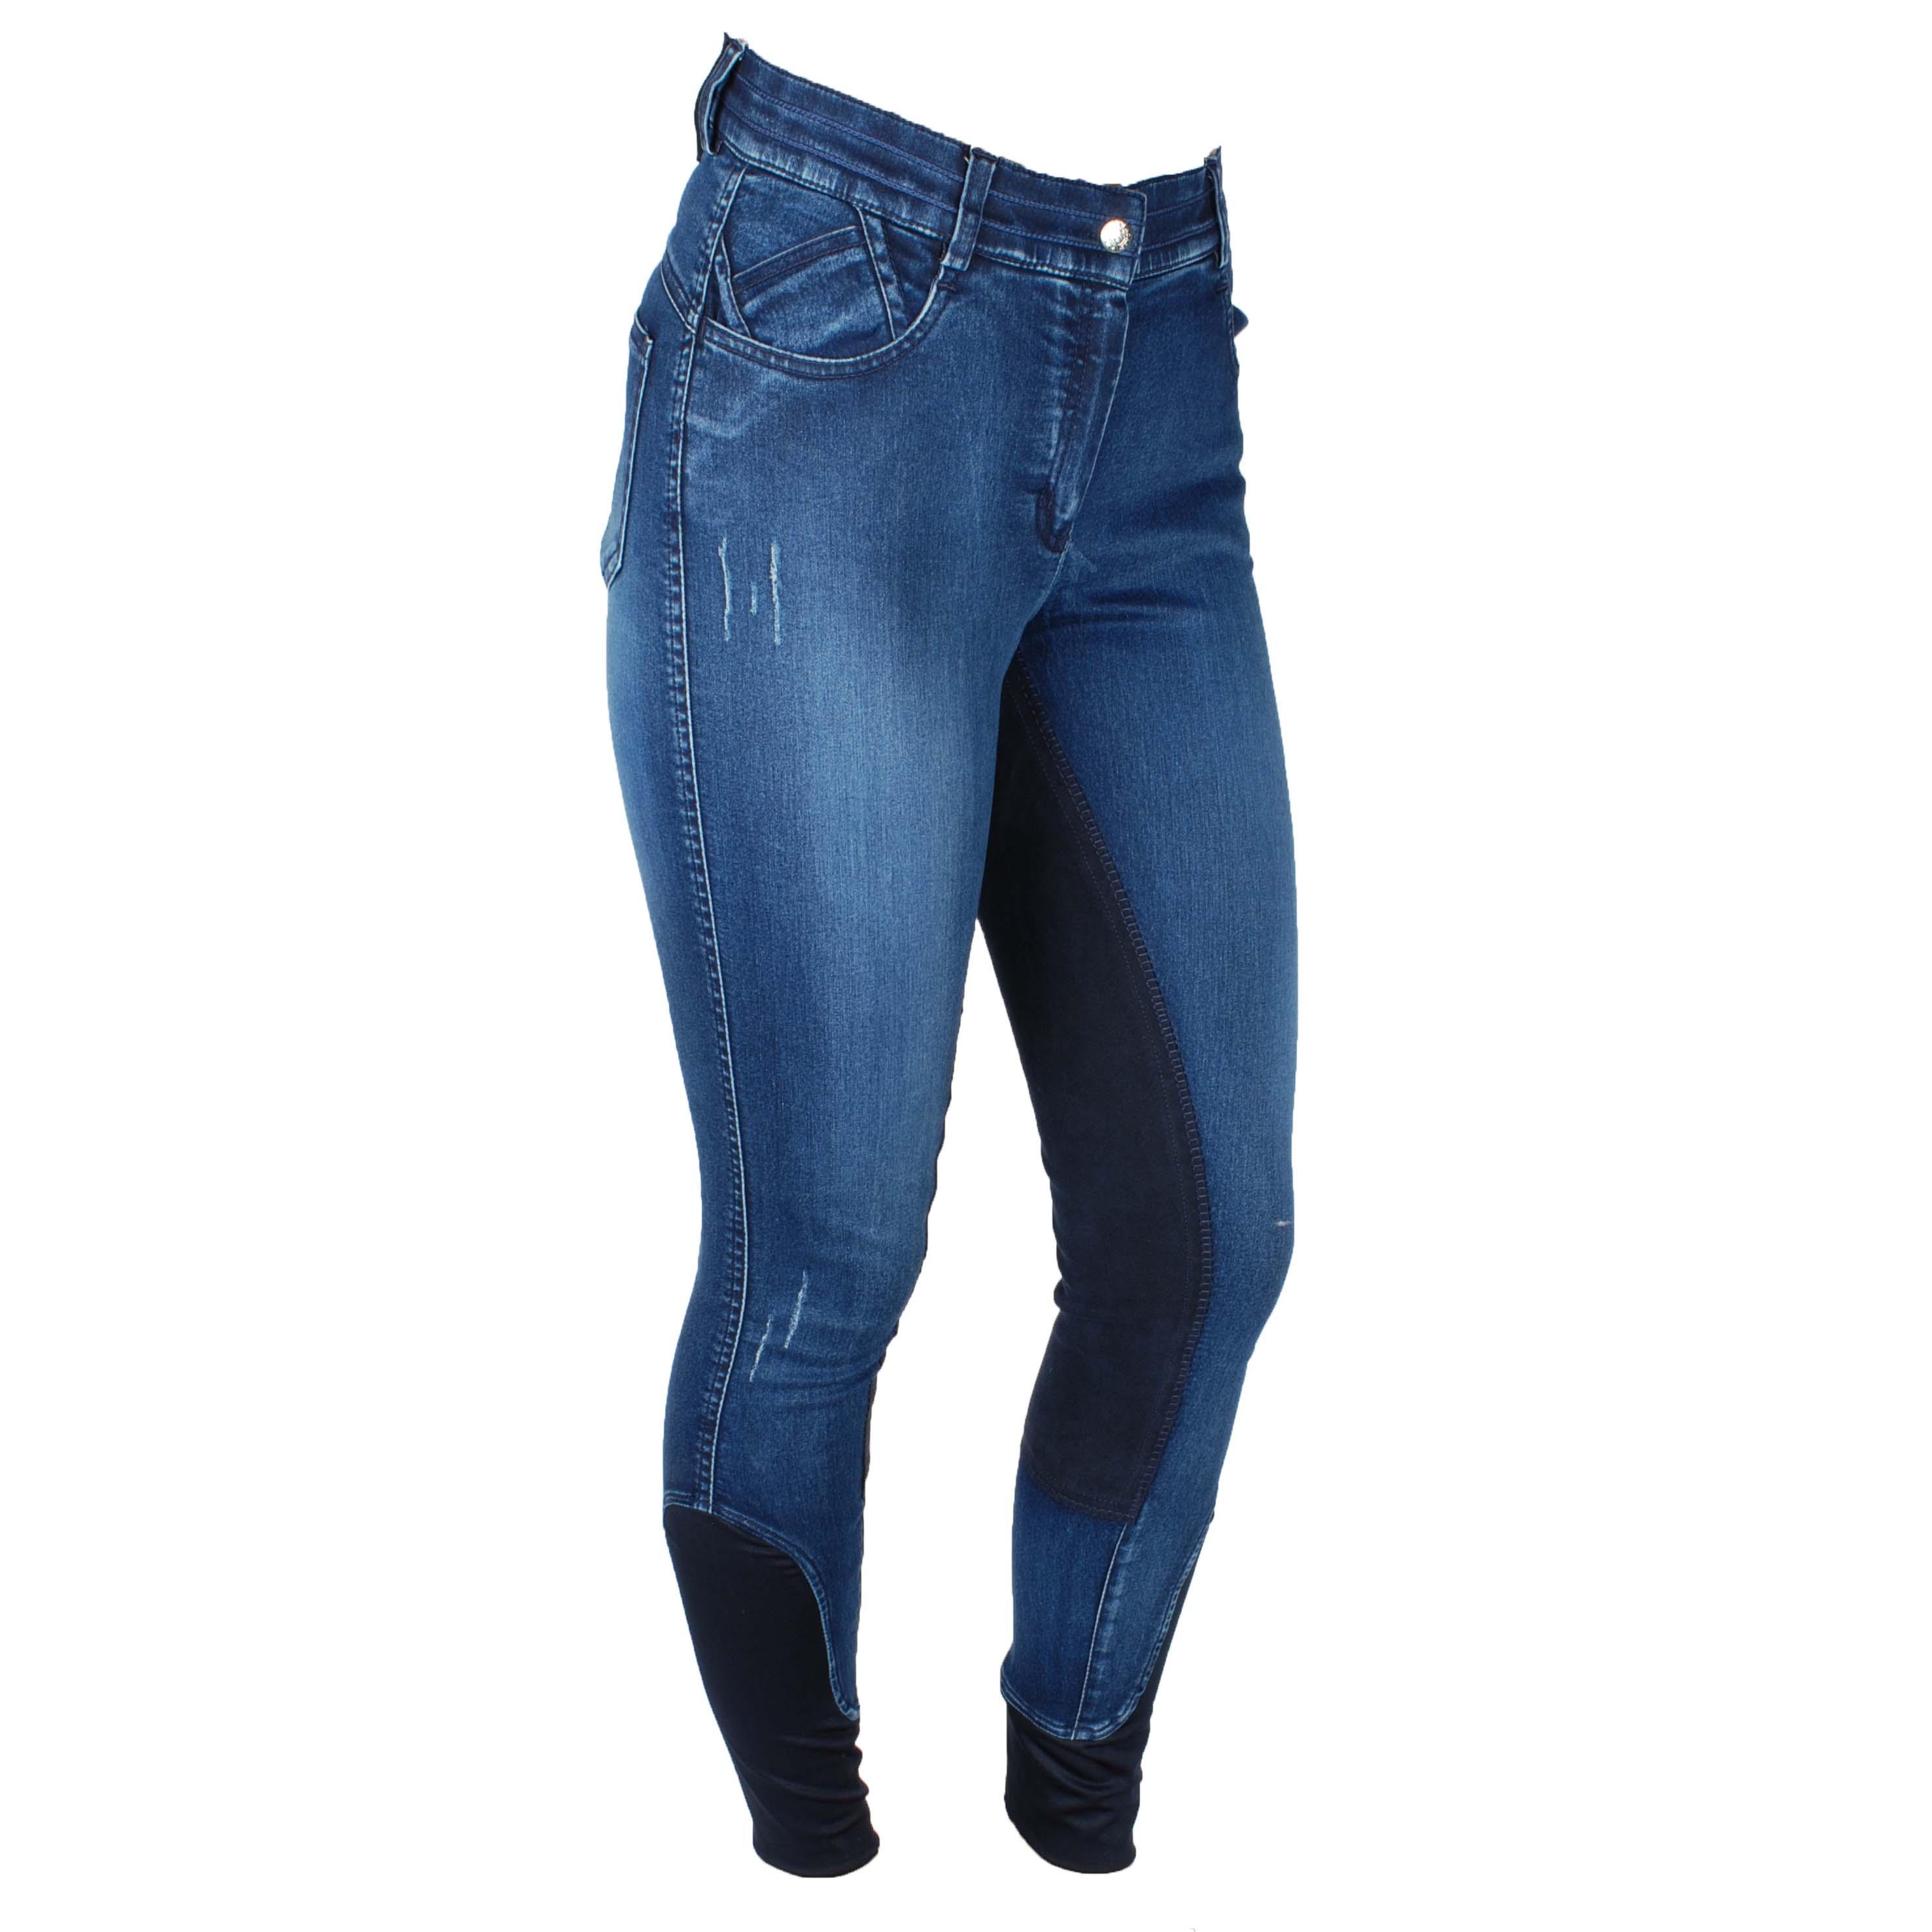 Harrys Horse Burton plus rijbroek jeans maat:36